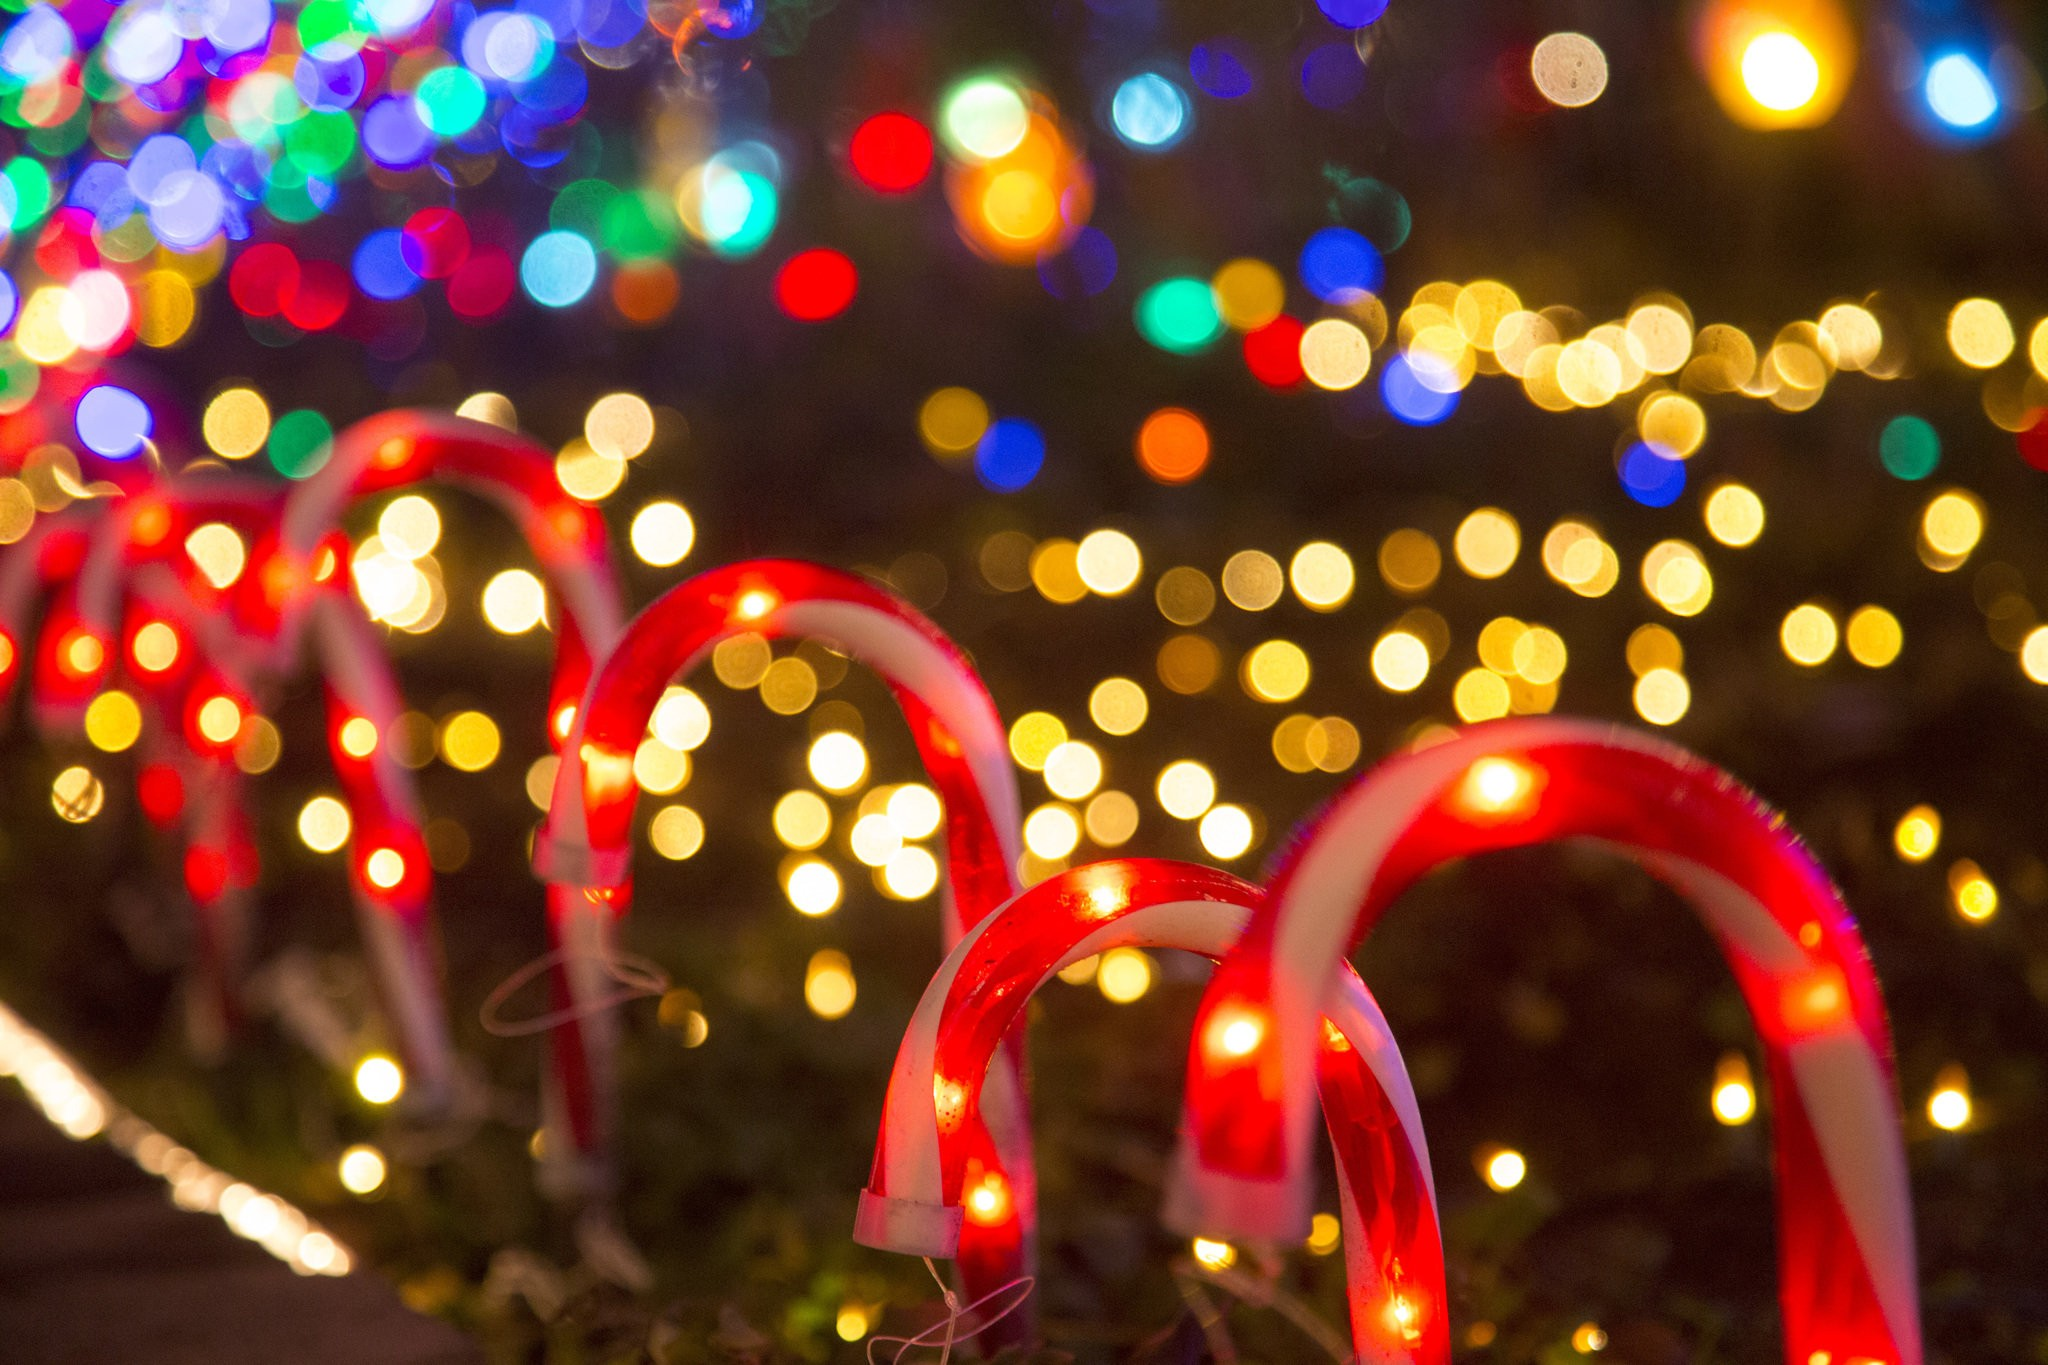 Oregon Gardens Christmas.The 10 Best Holiday Light Displays Around Portland